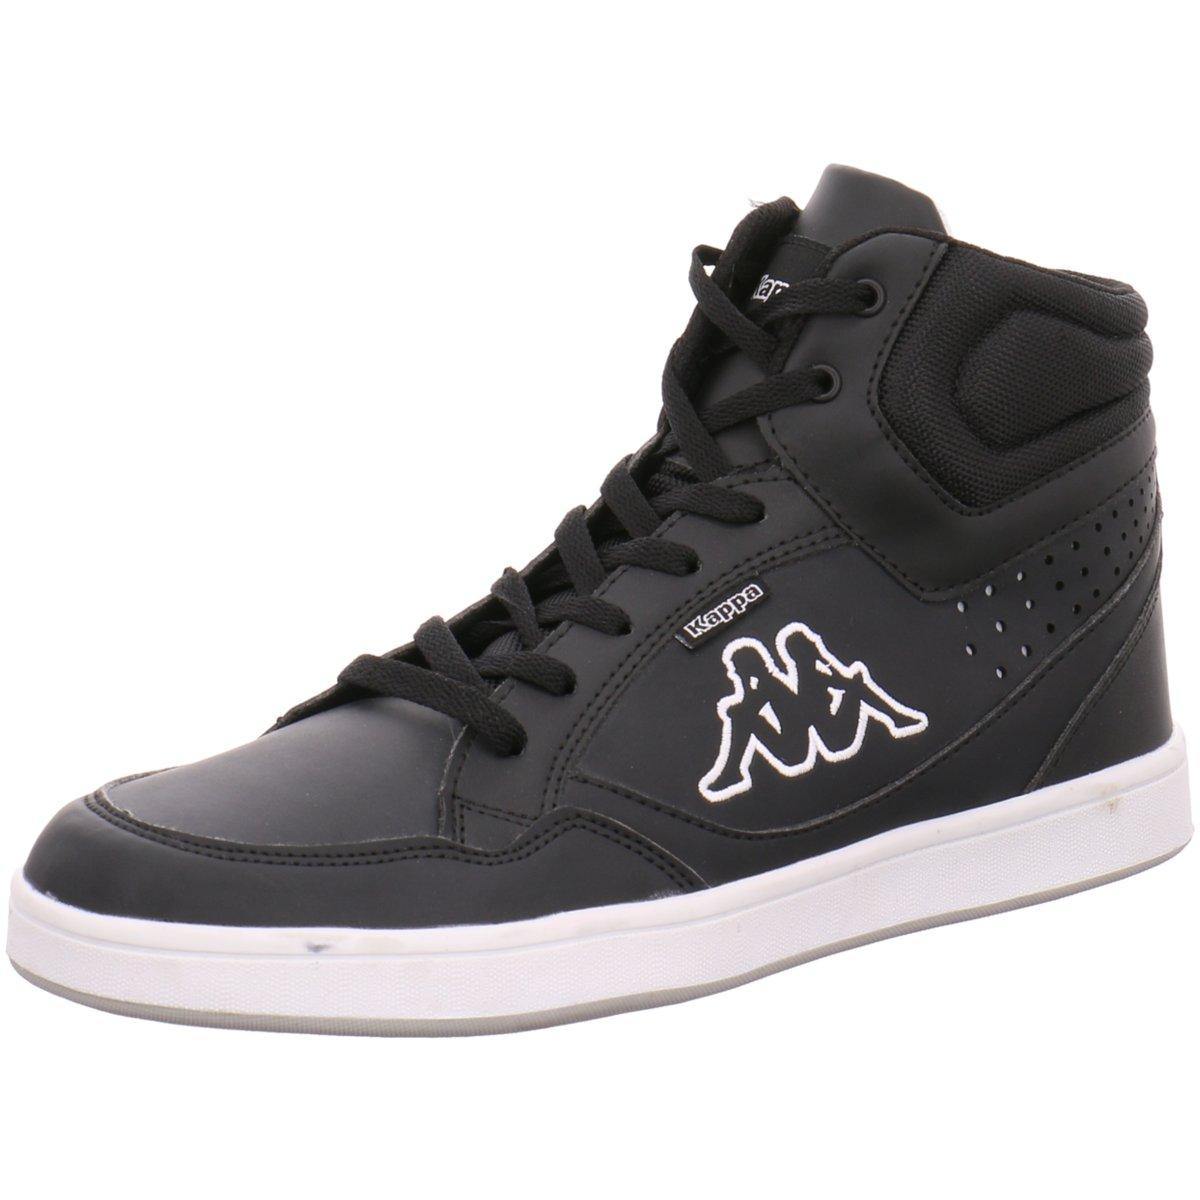 Kappa Style Herren Sneakers Rot